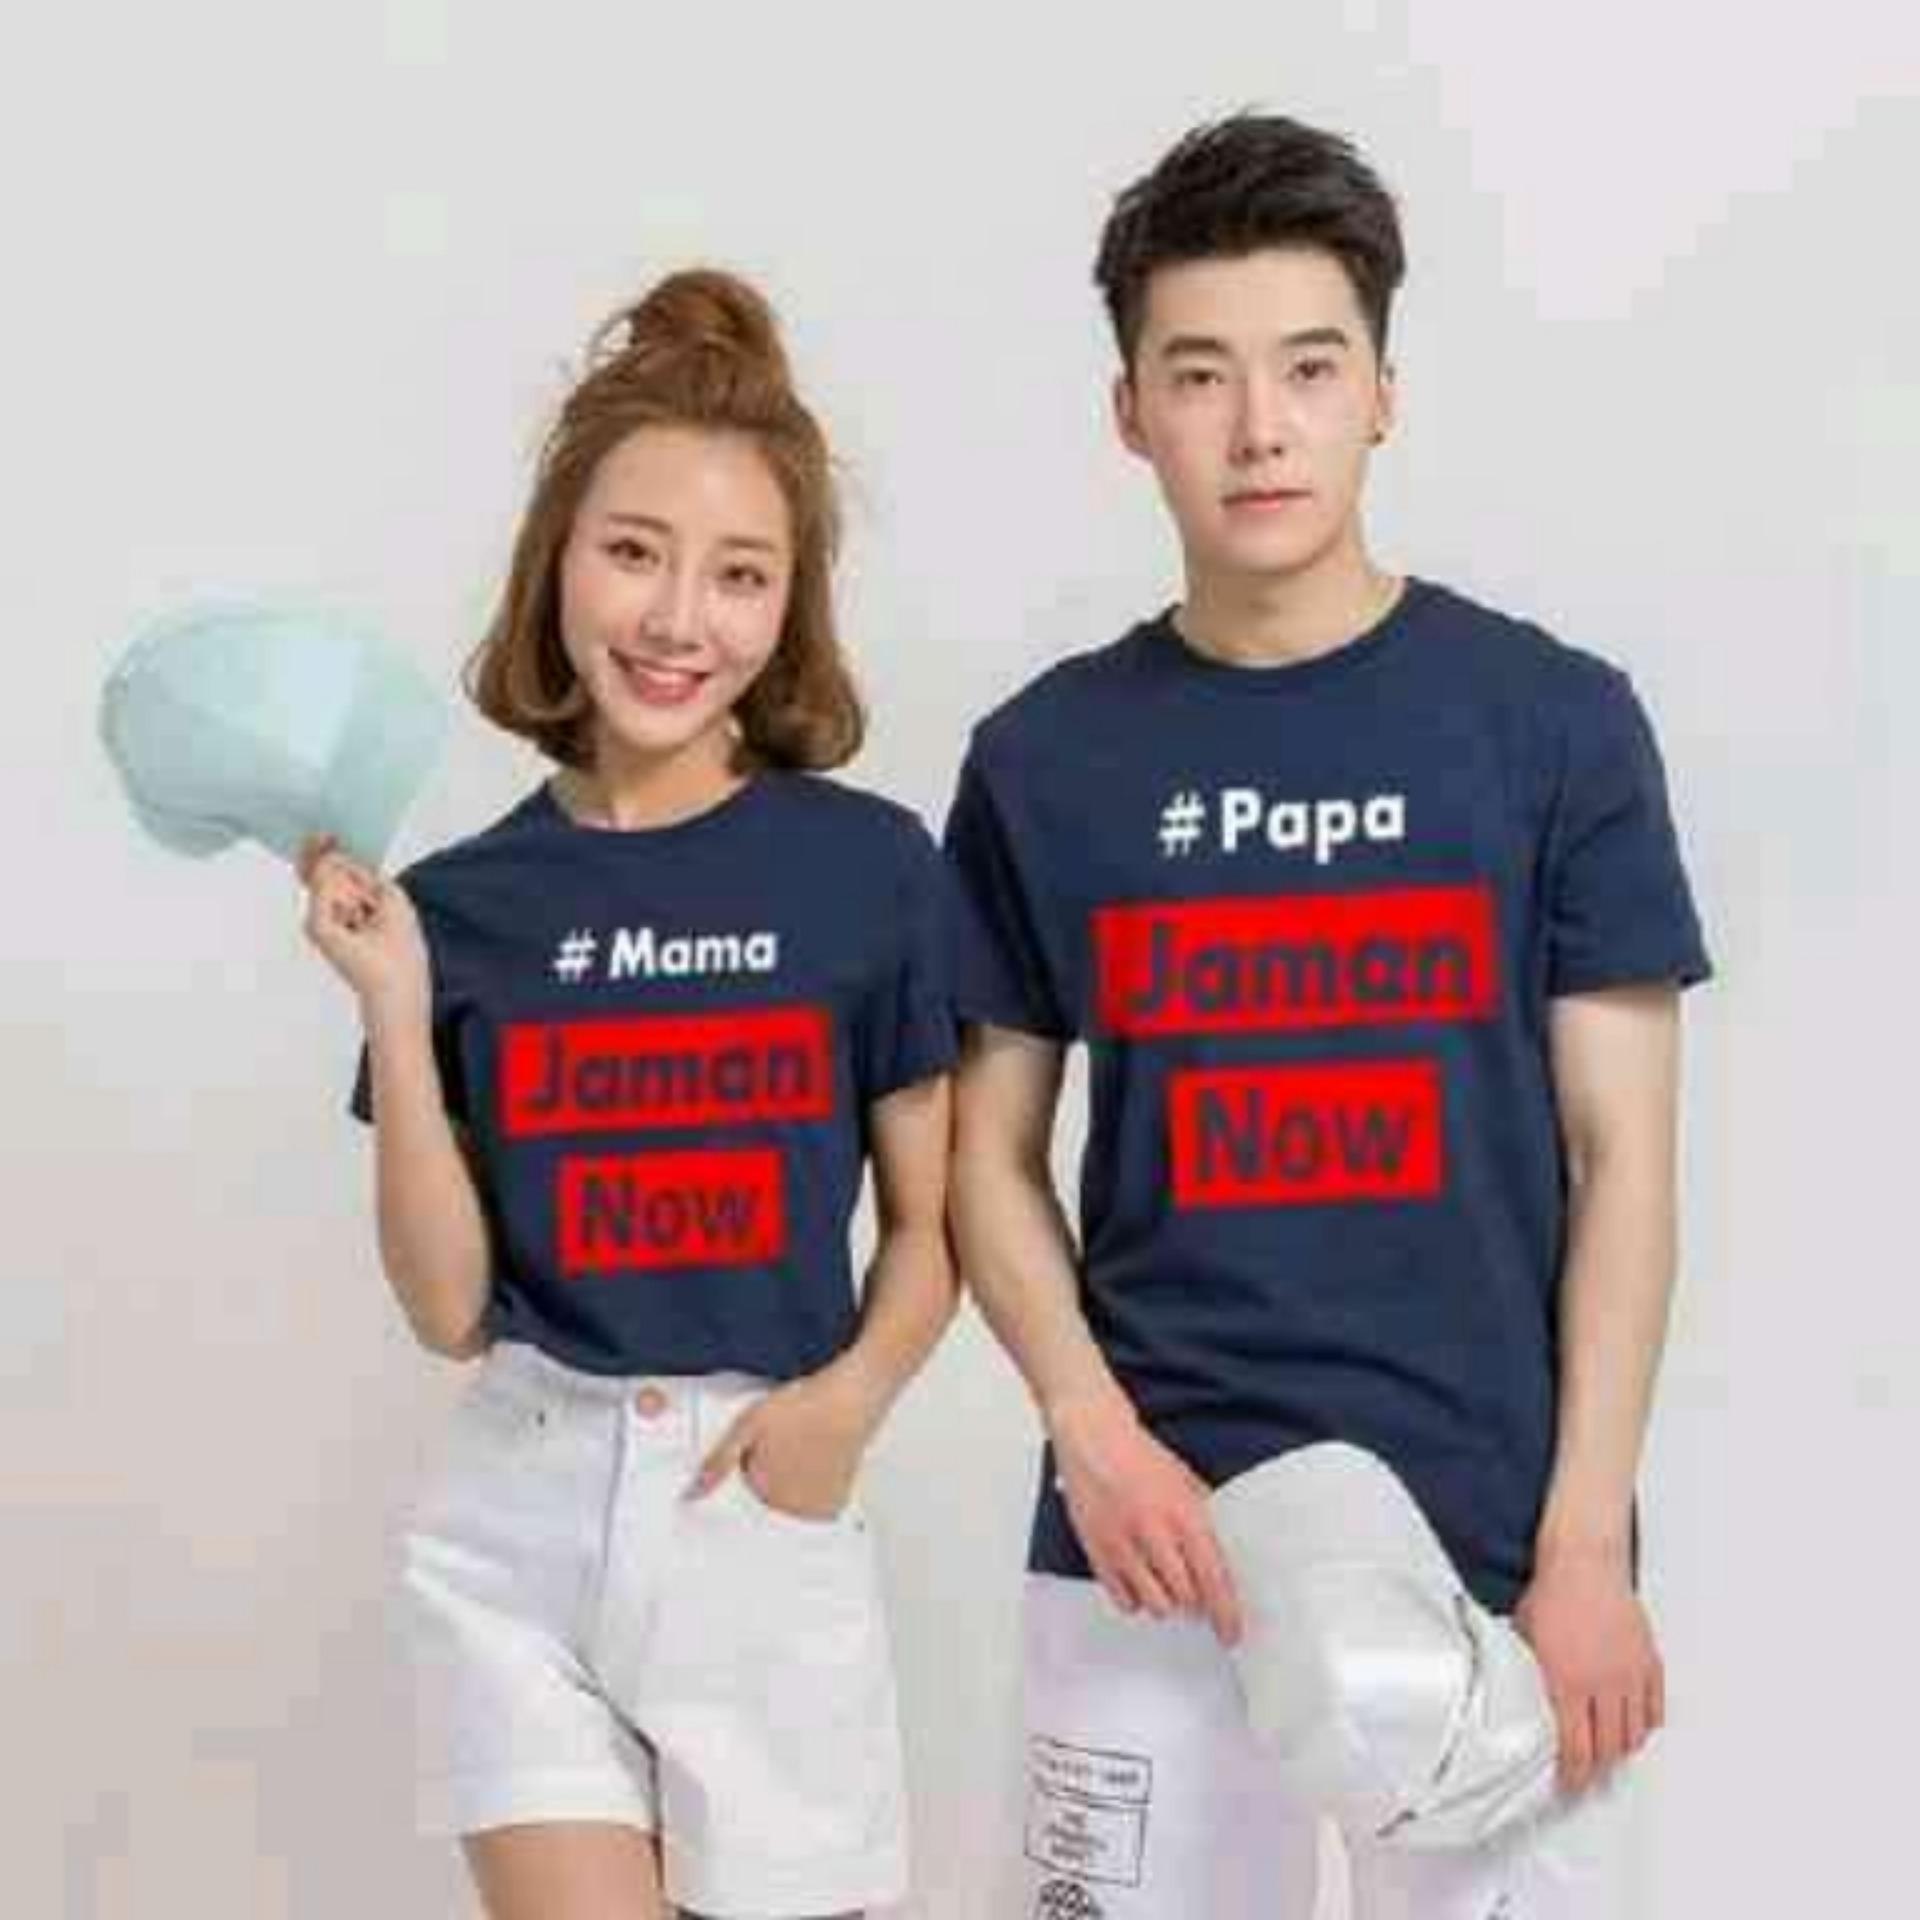 Vrichel Collection Couple / T-Shirt / Kaos / T-Shirt Couple PAMA ZAMAN NOW